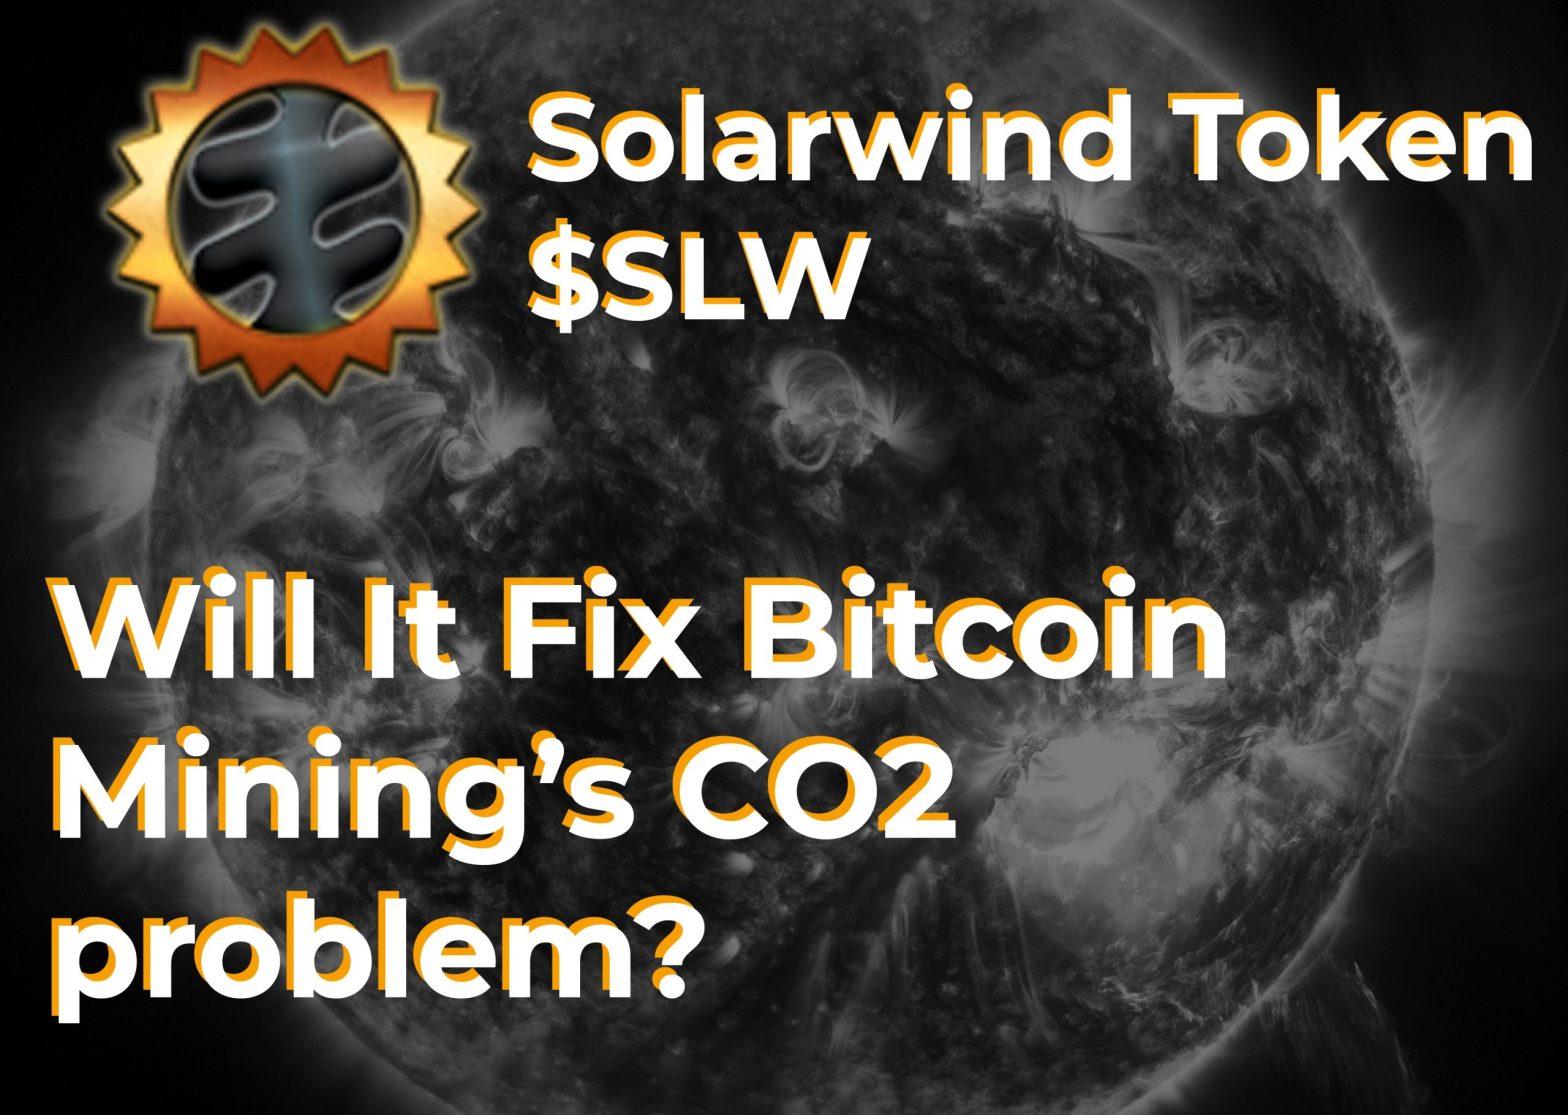 Solarwind Token Promo